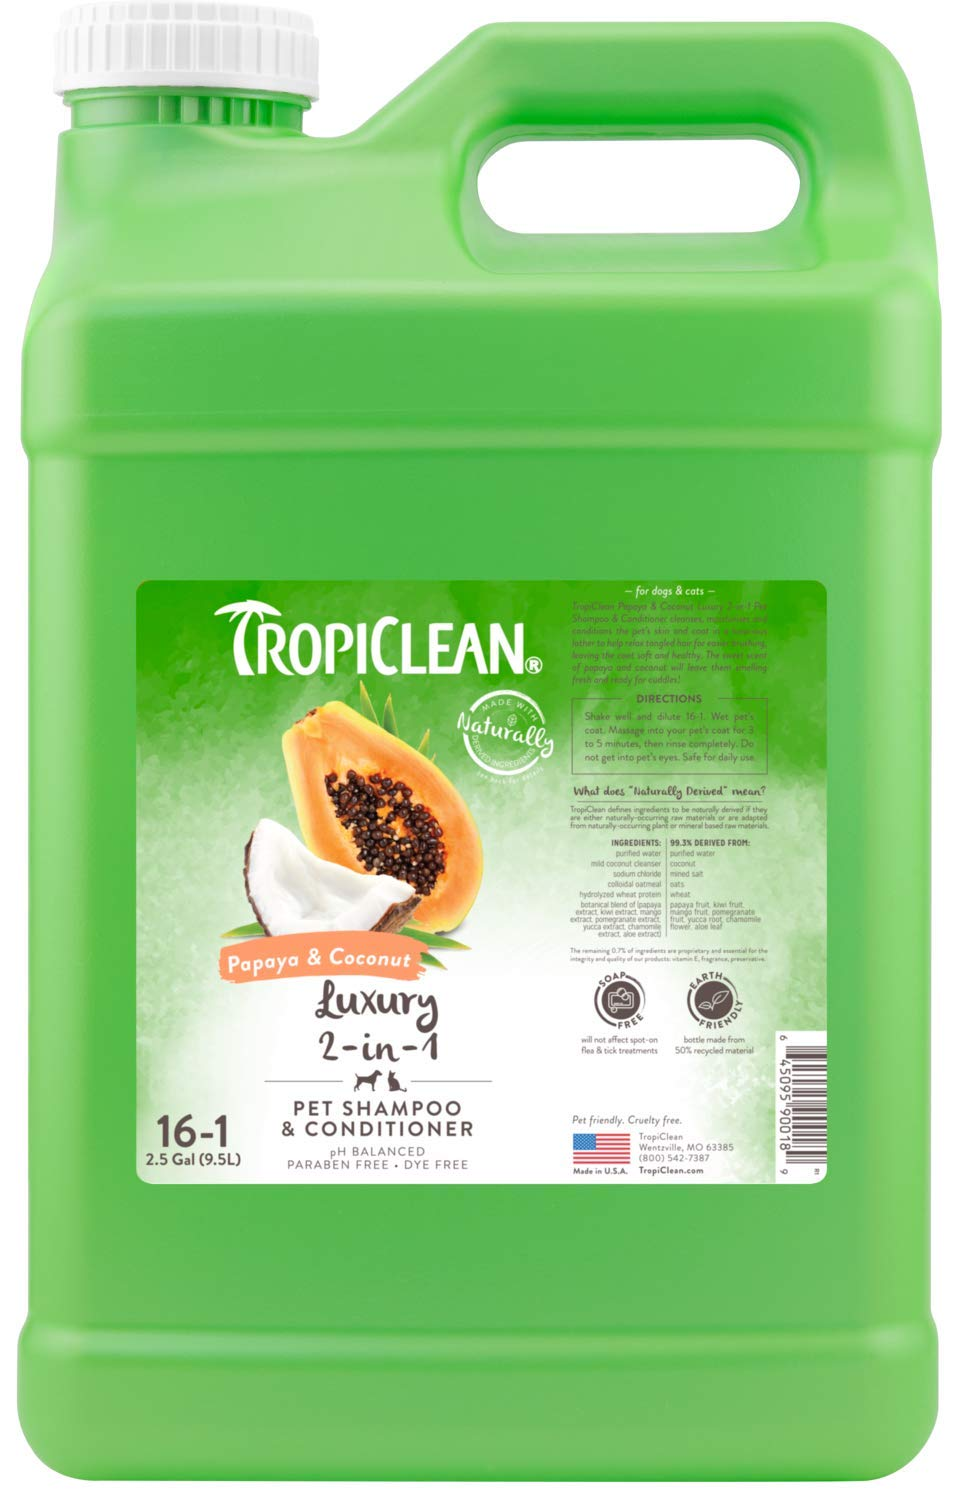 TropiClean Papaya & Coconut 2-in-1 Pet Shampoo, 2.5 Gallon